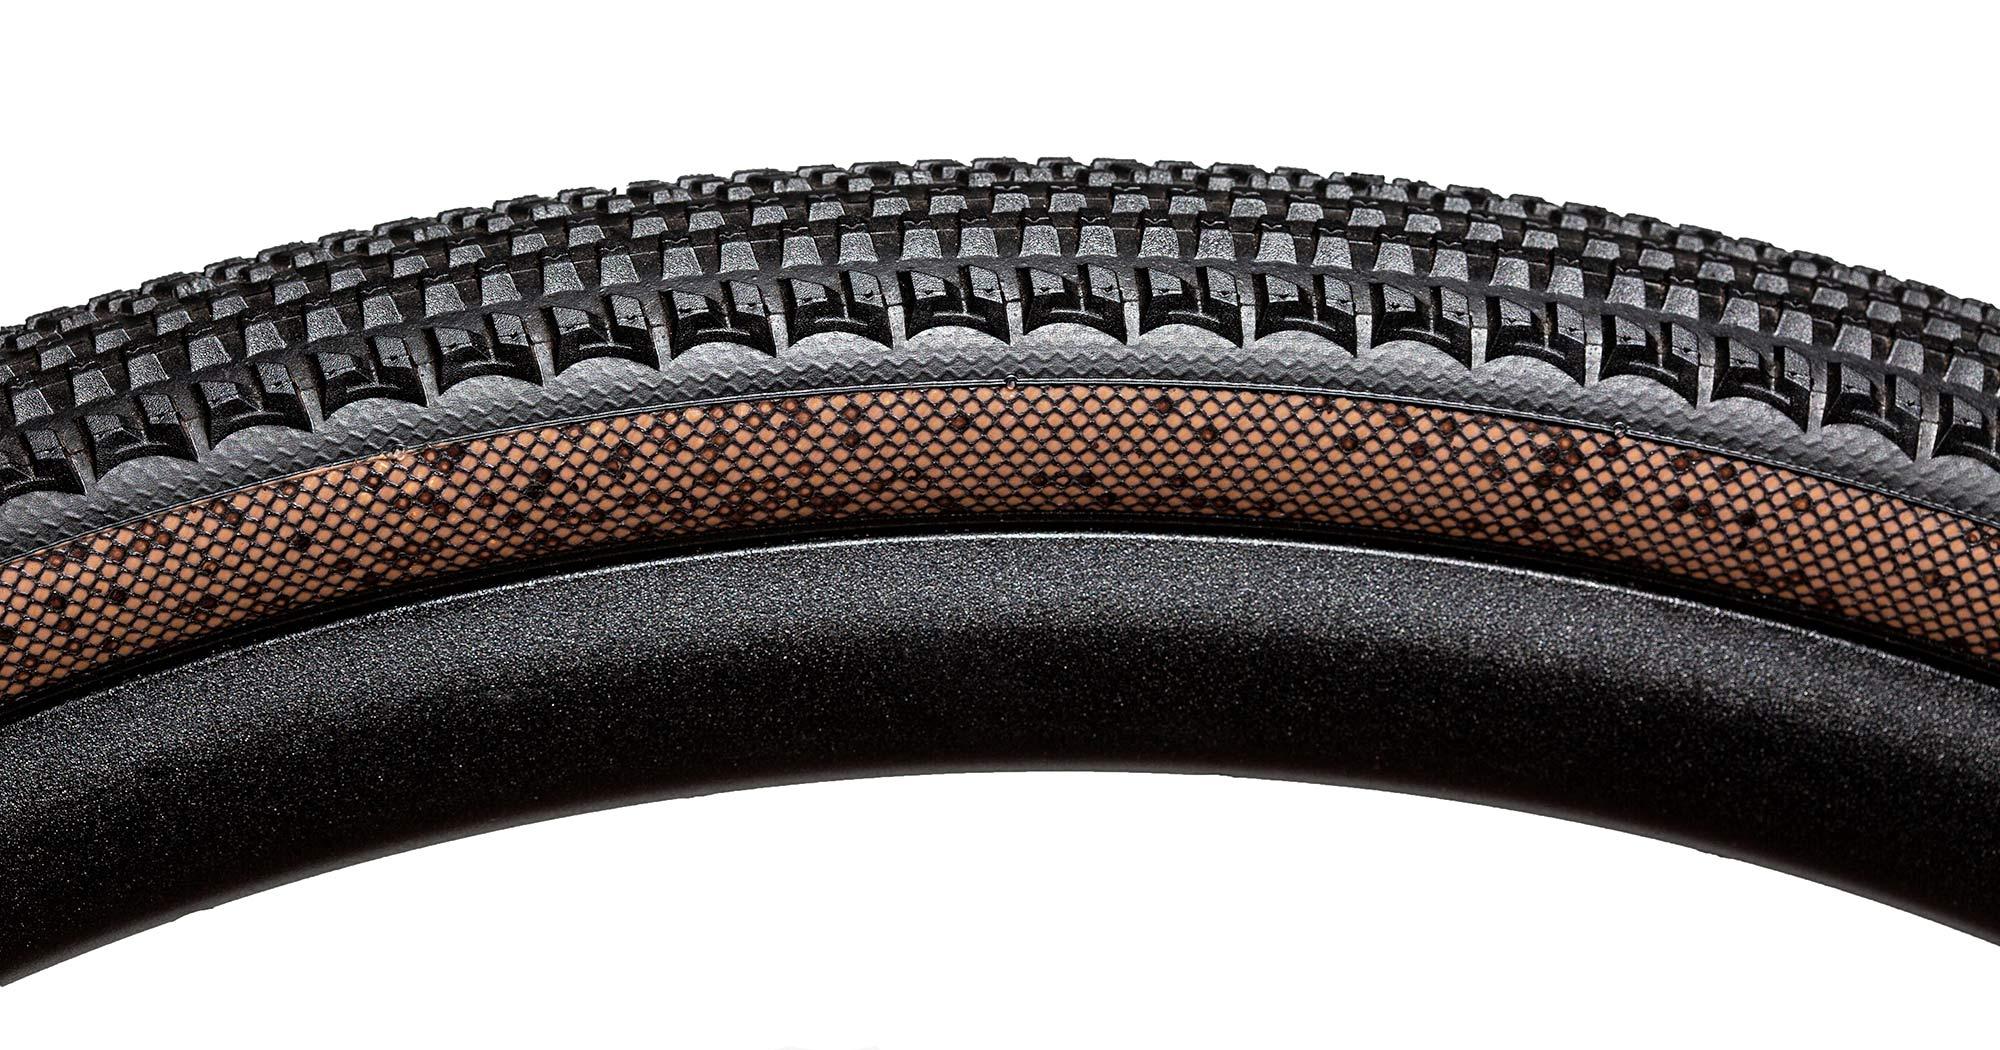 Hutchinson Gridskin lightweight reinforced sustainable gravel road bike tires,Toureg